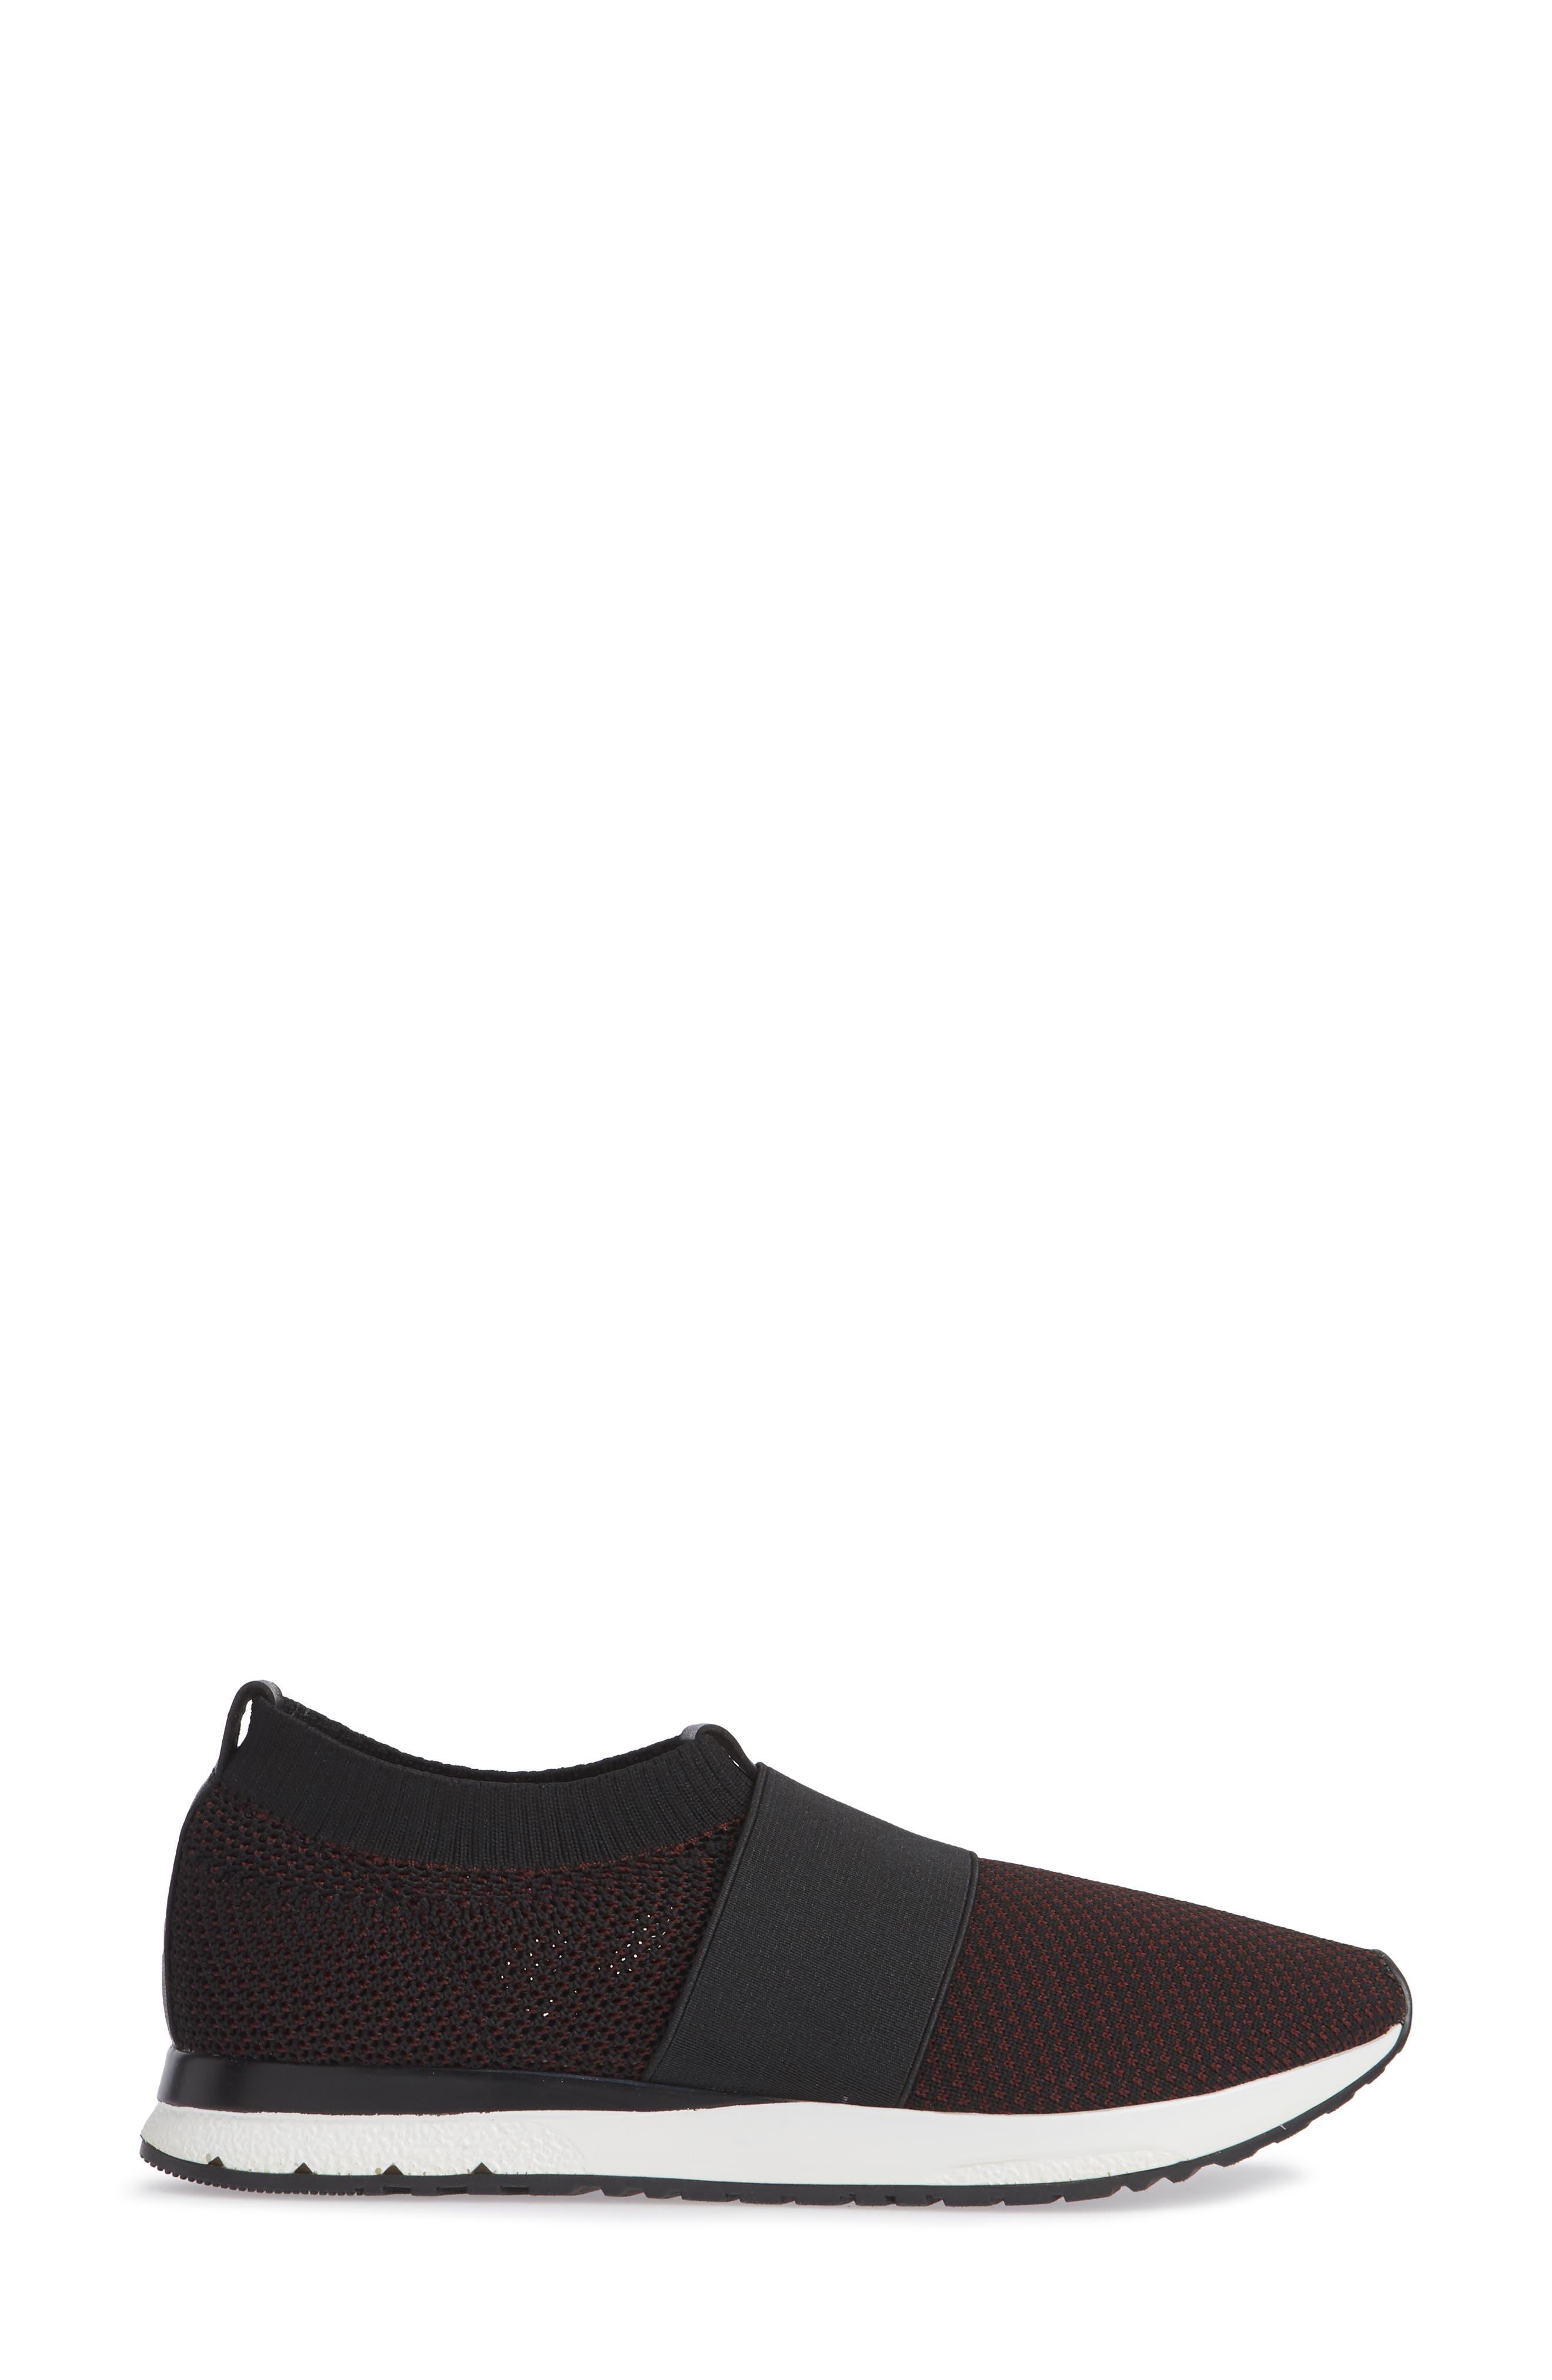 ,                             Brooke Slip-On Sneaker,                             Alternate thumbnail 3, color,                             BLACK/ WINE KNIT FABRIC